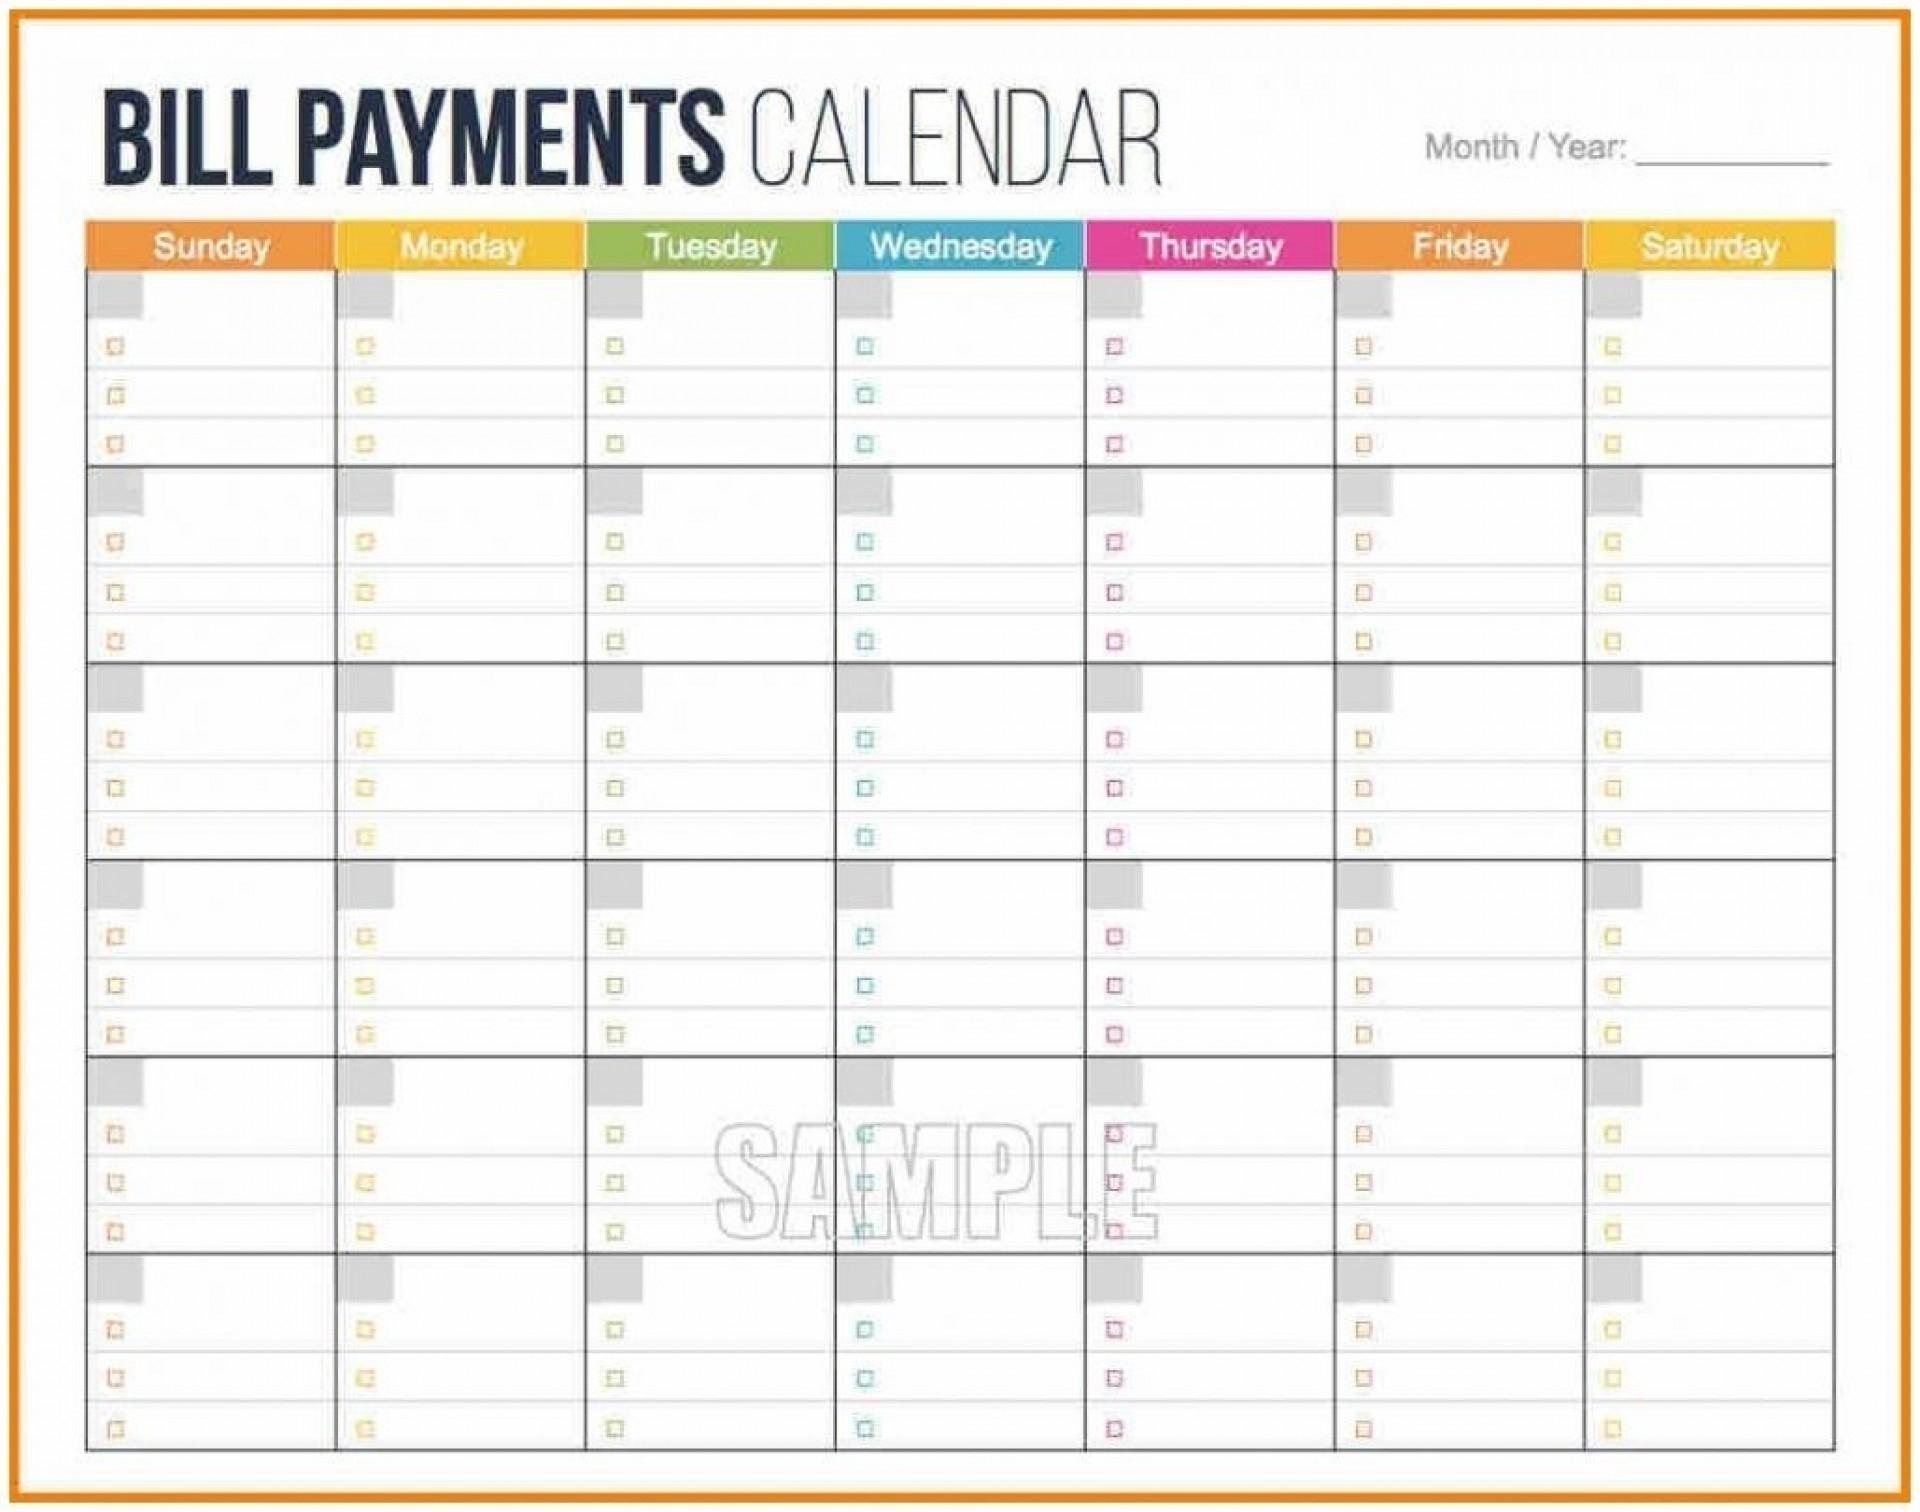 Printable Bill Calendar 2020 Monthly | Calendar Template  Printable Bill Pay Calendar 2020